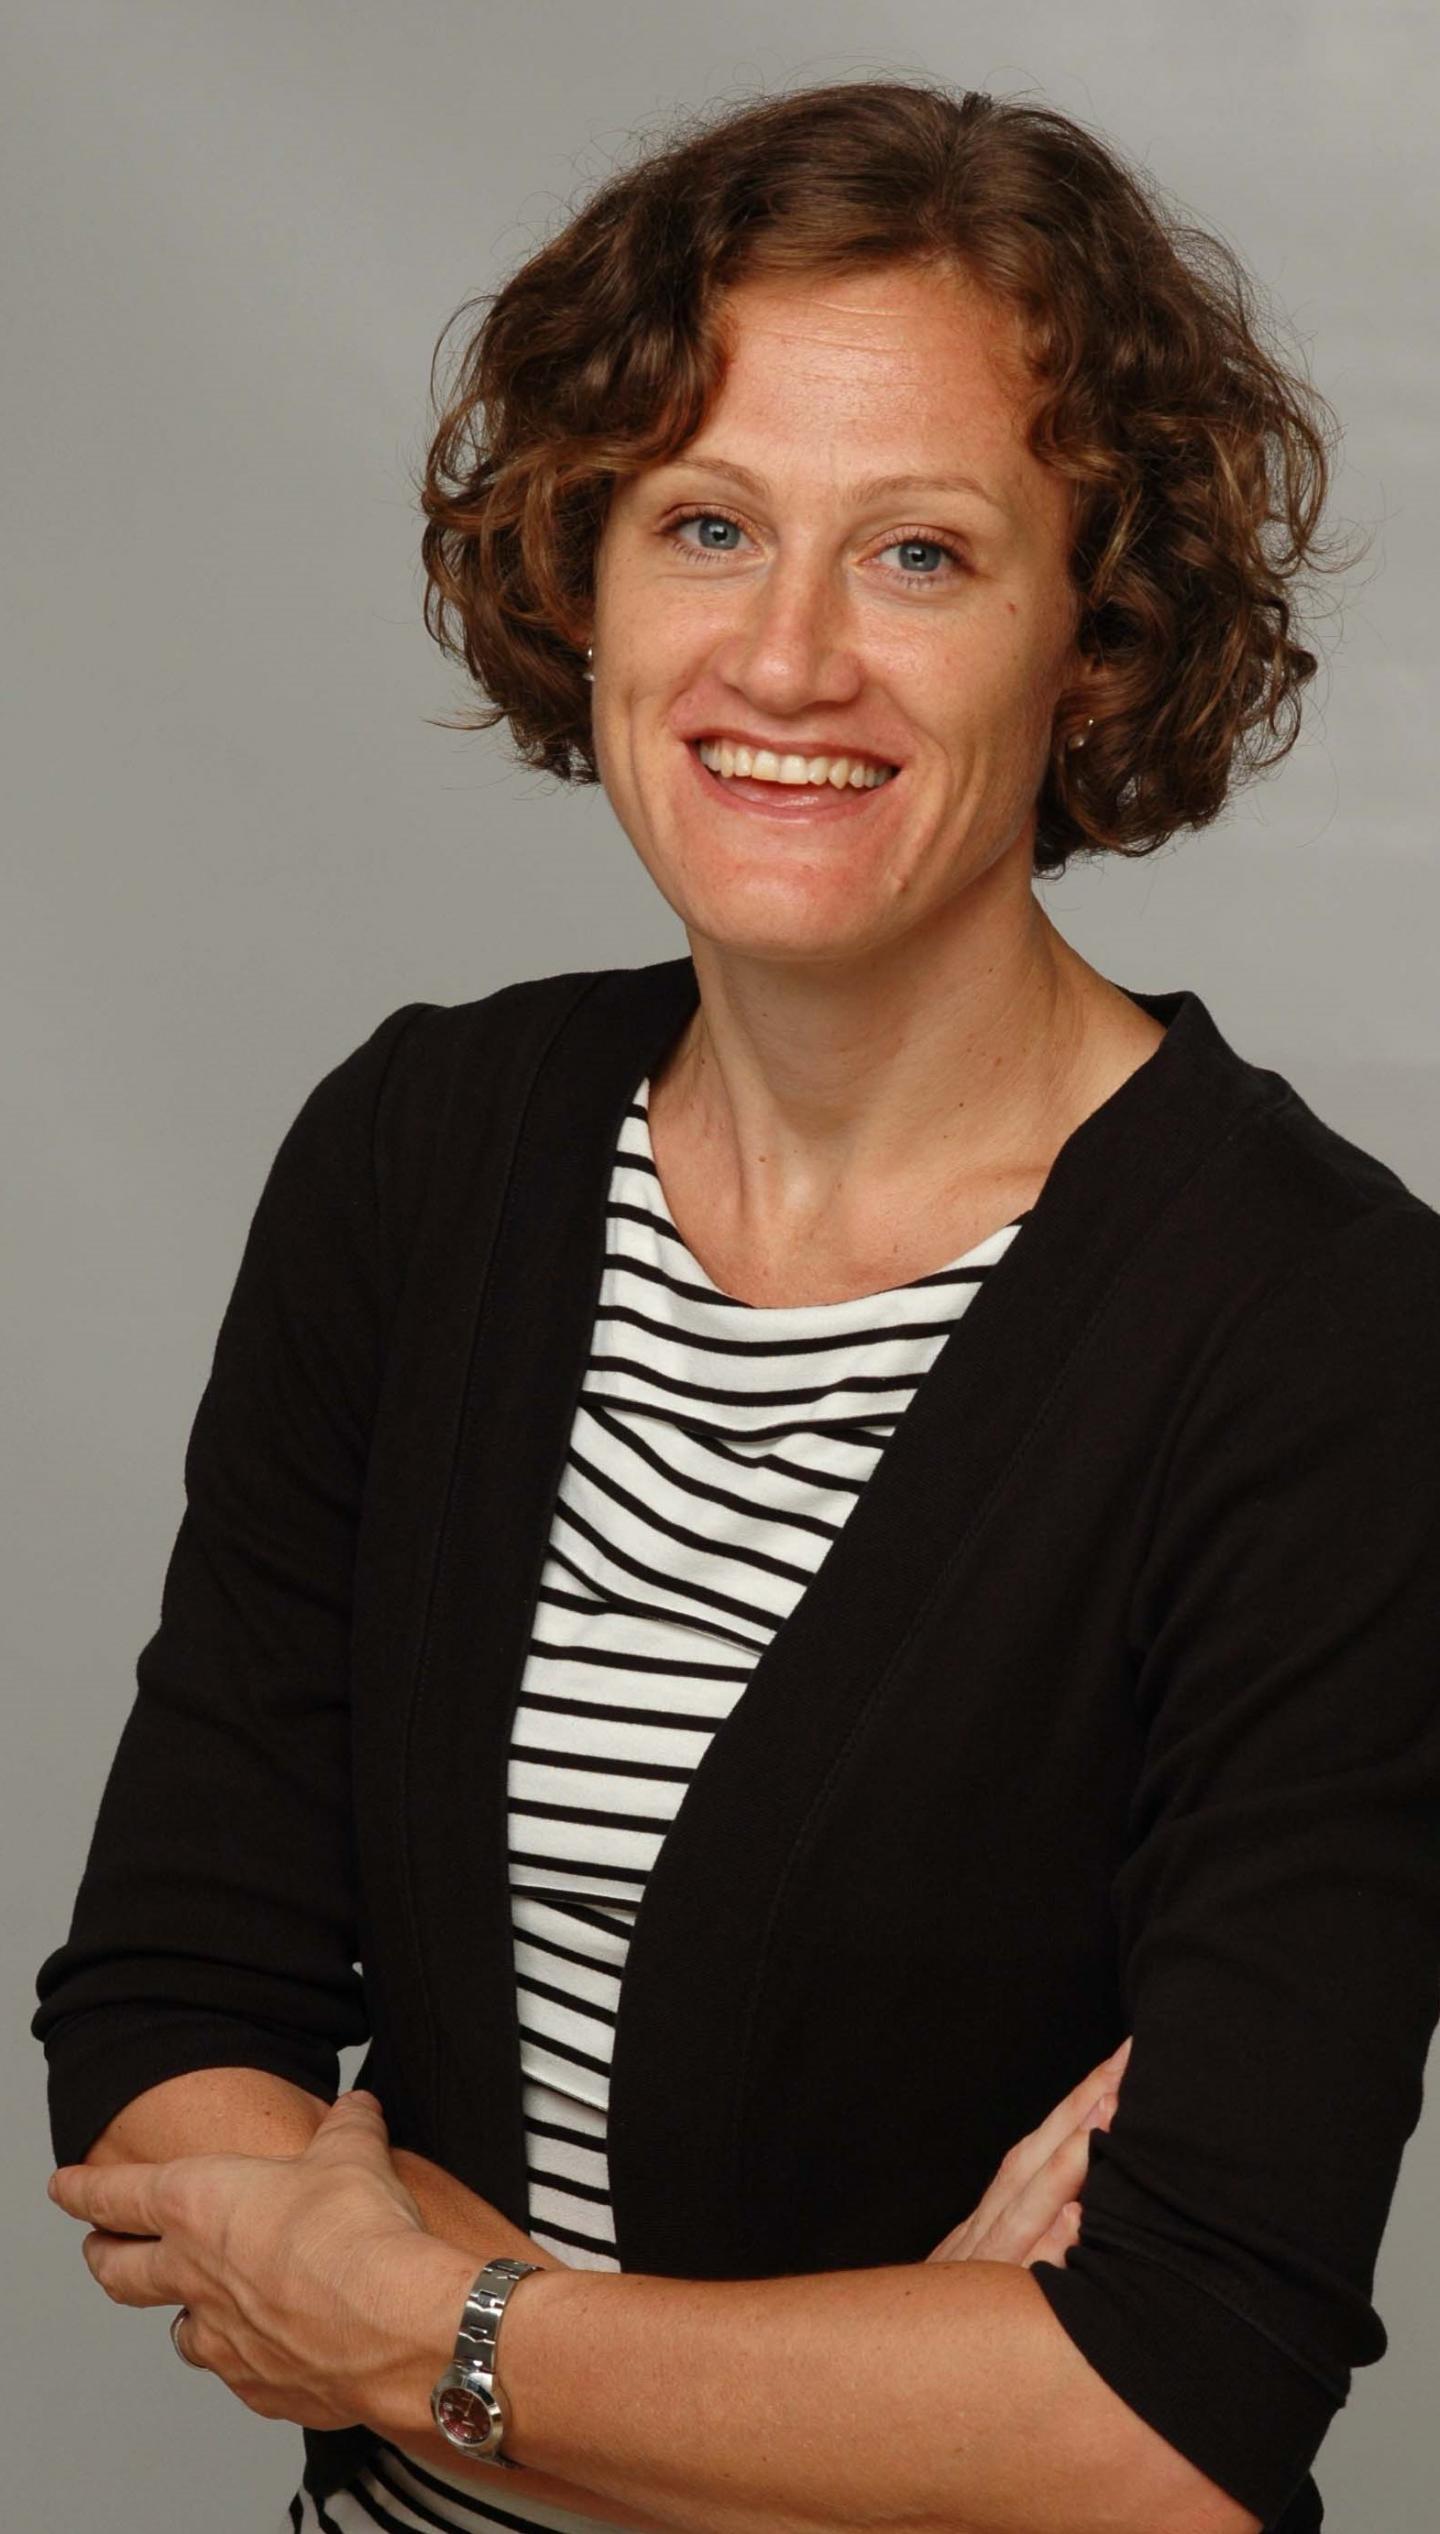 Leontine Alkema, University of Massachusetts at Amherst